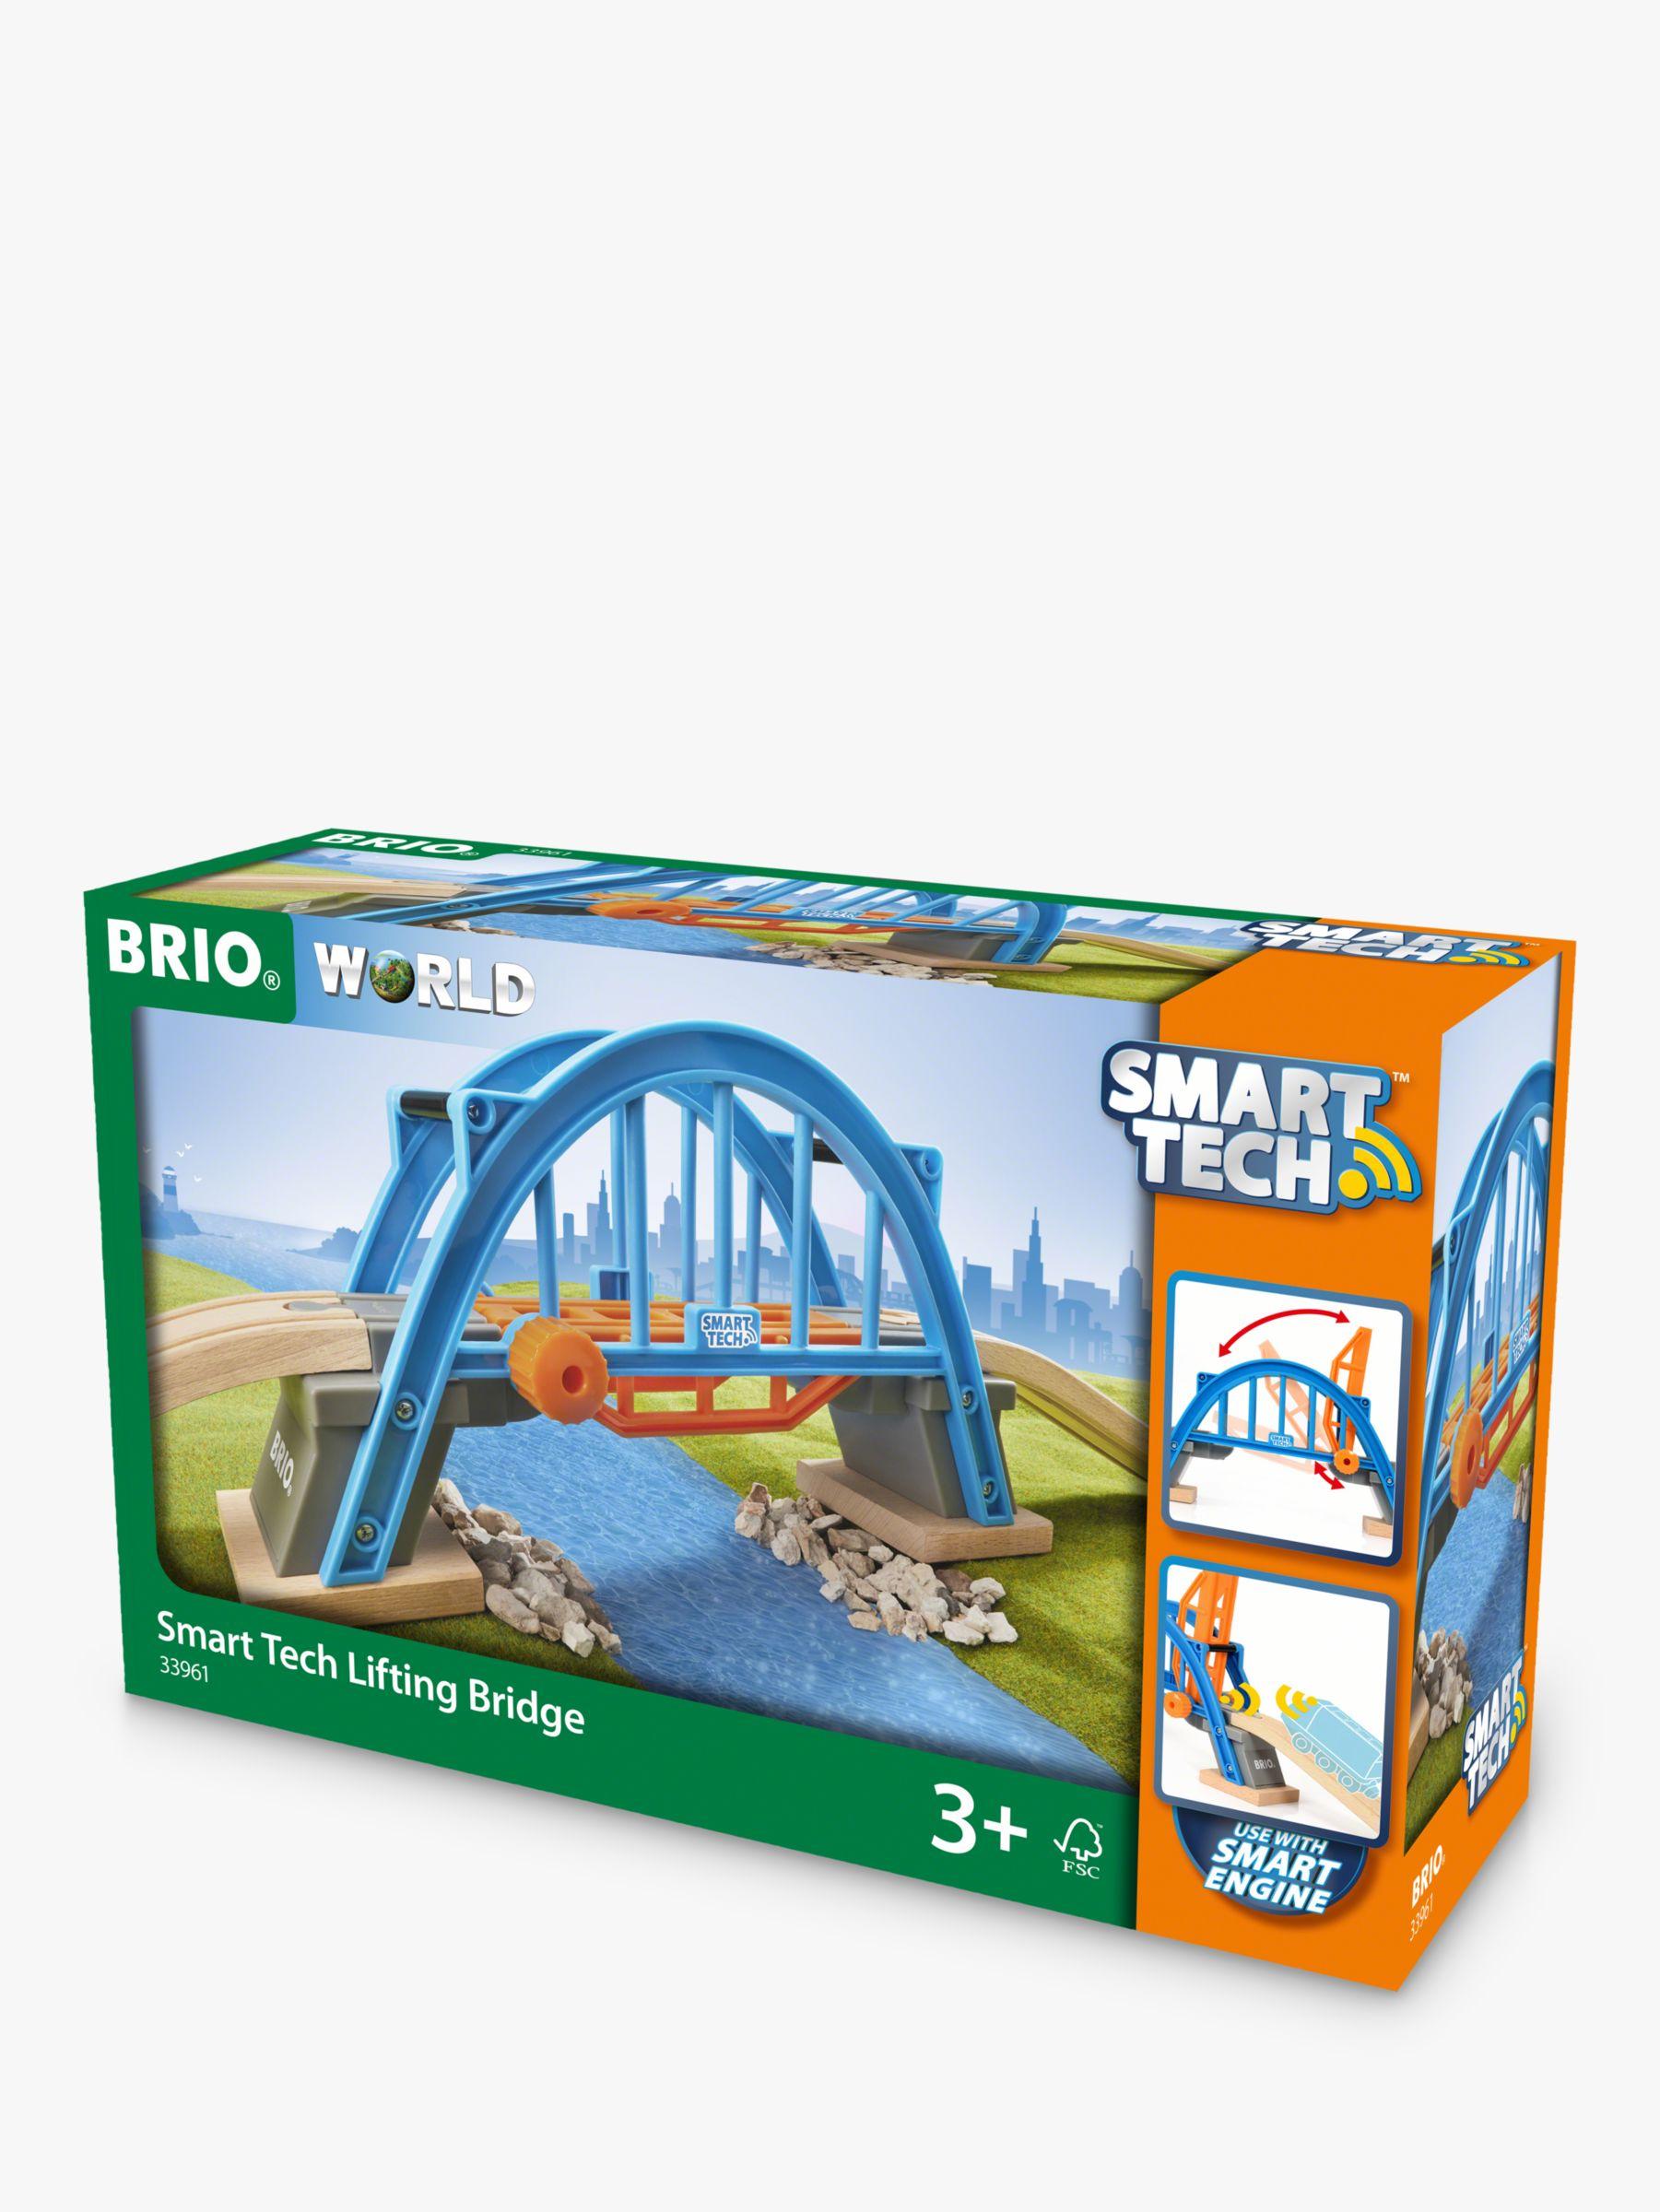 BRIO BRIO World Smart Tech Lifting Bridge